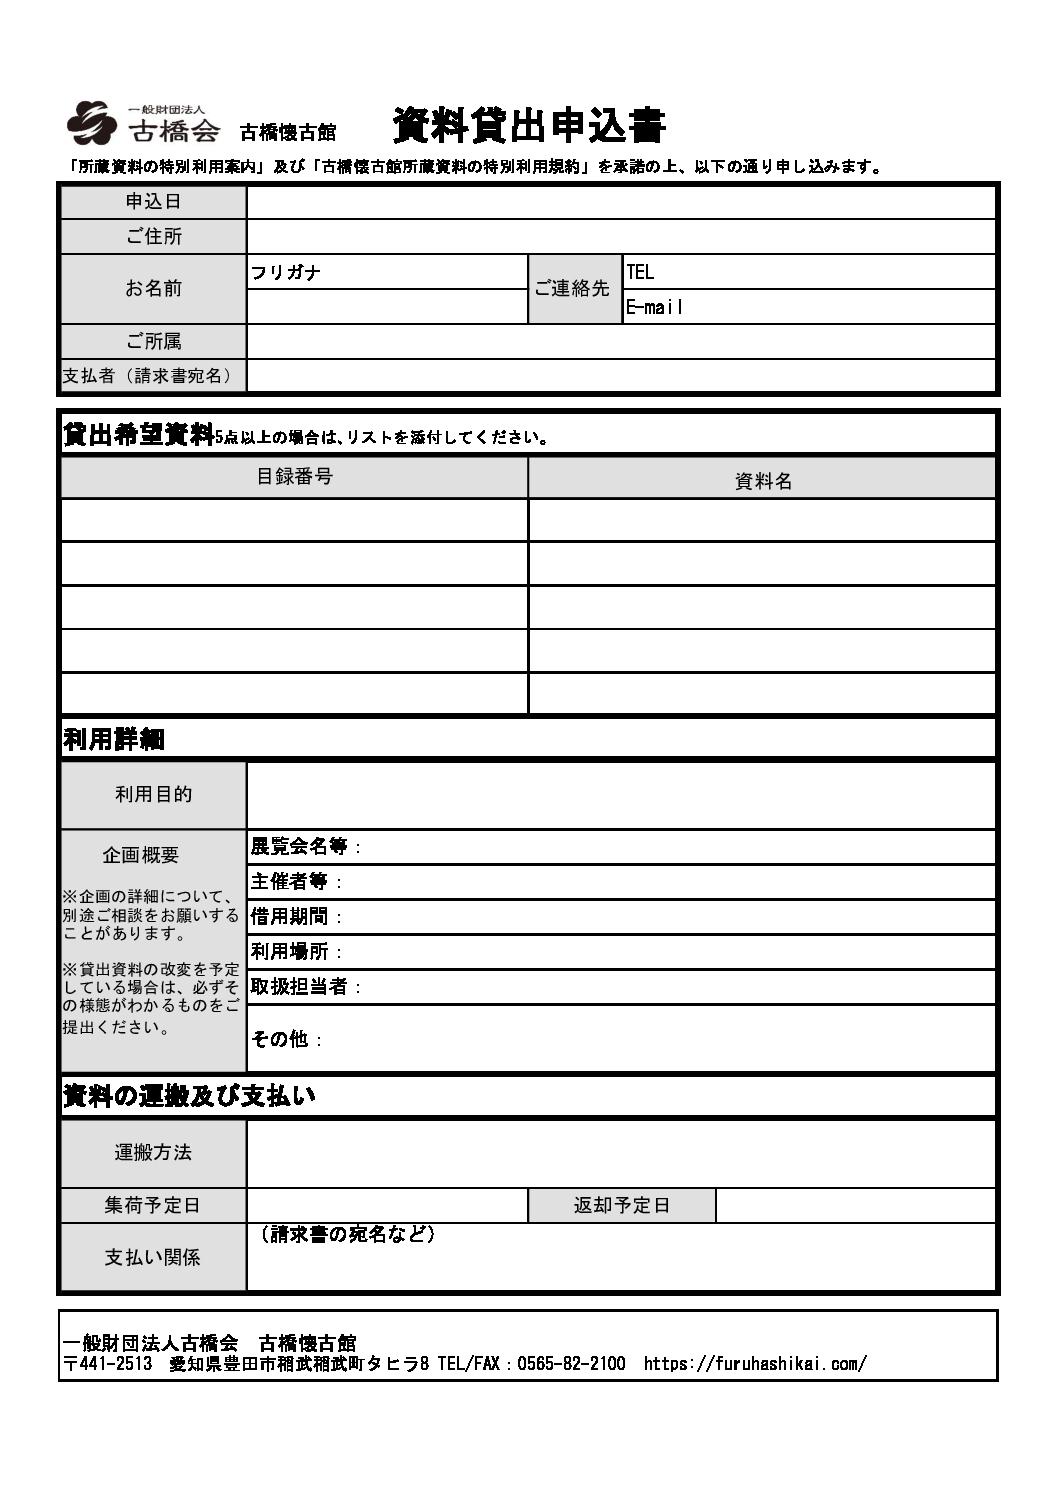 lending_furuhashikaikokan